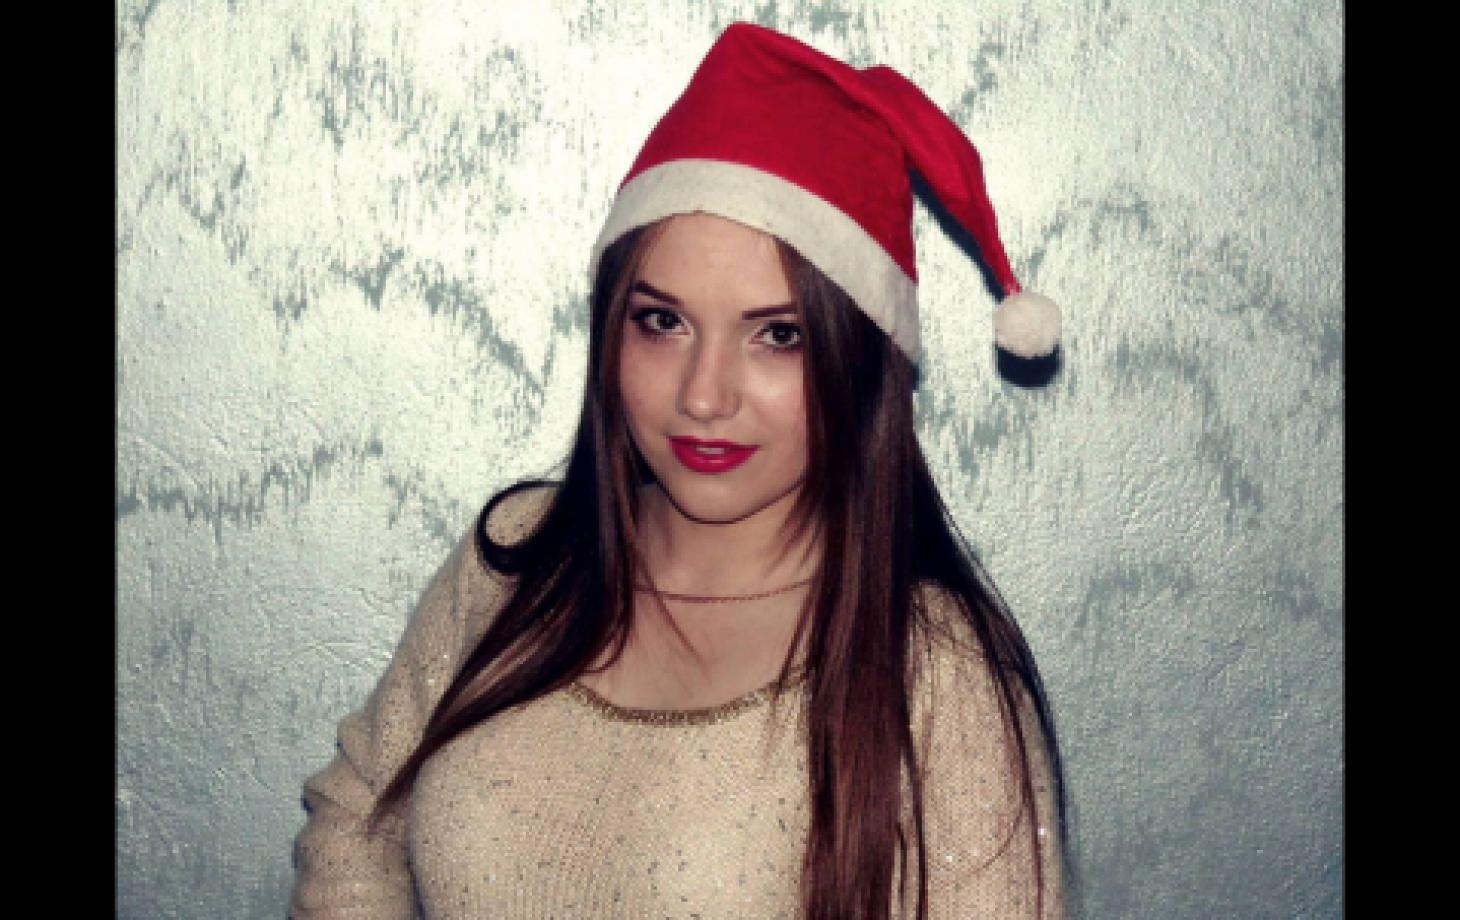 Марина Кукуету, 20 лет